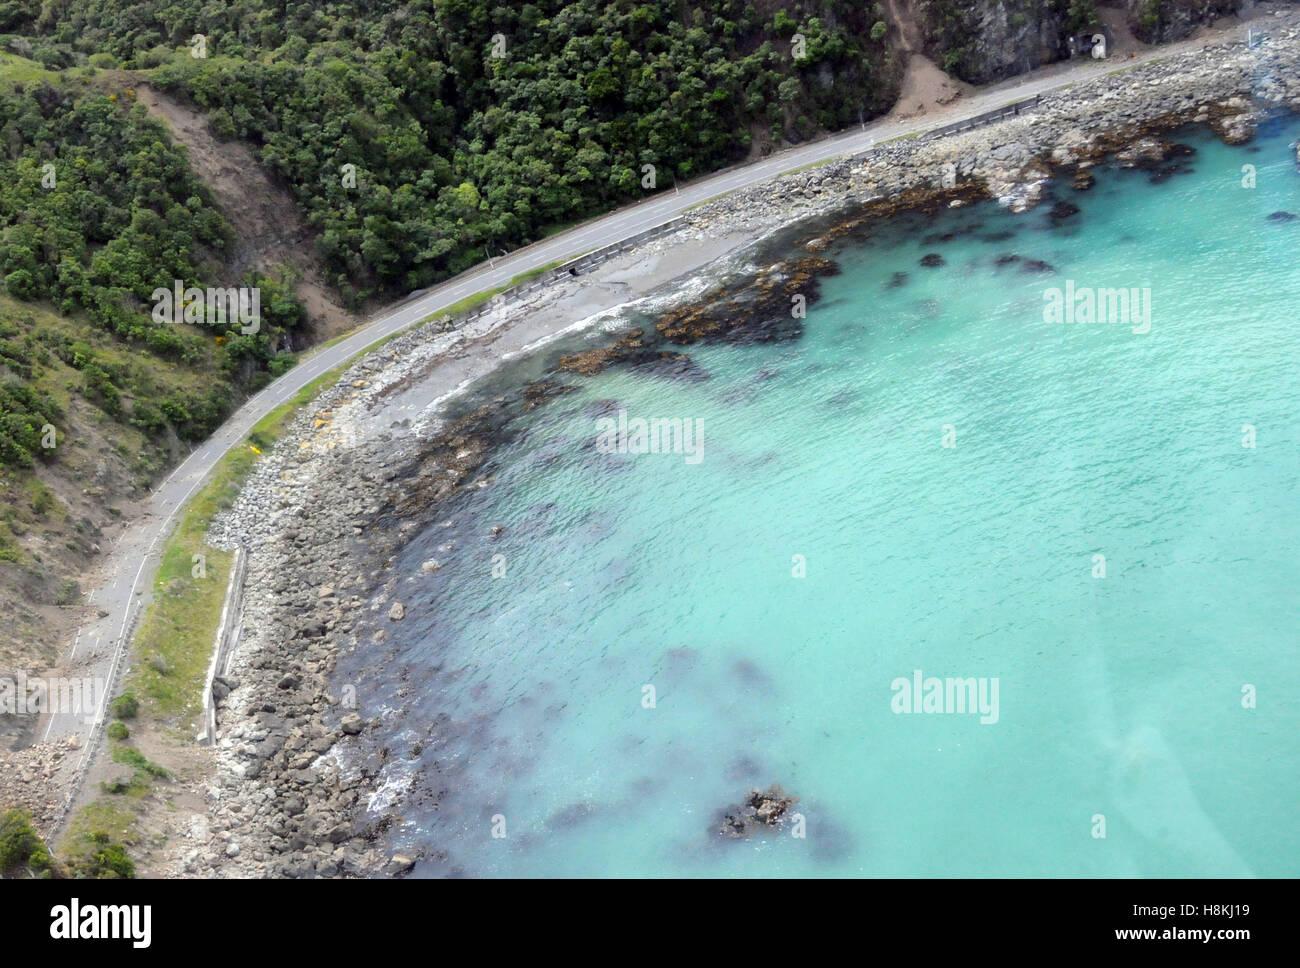 Kaikoura. 14 Nov, 2016. Foto aérea tomada el 14 de noviembre, 2016 muestra la deteriorada carretera cerca de Imagen De Stock